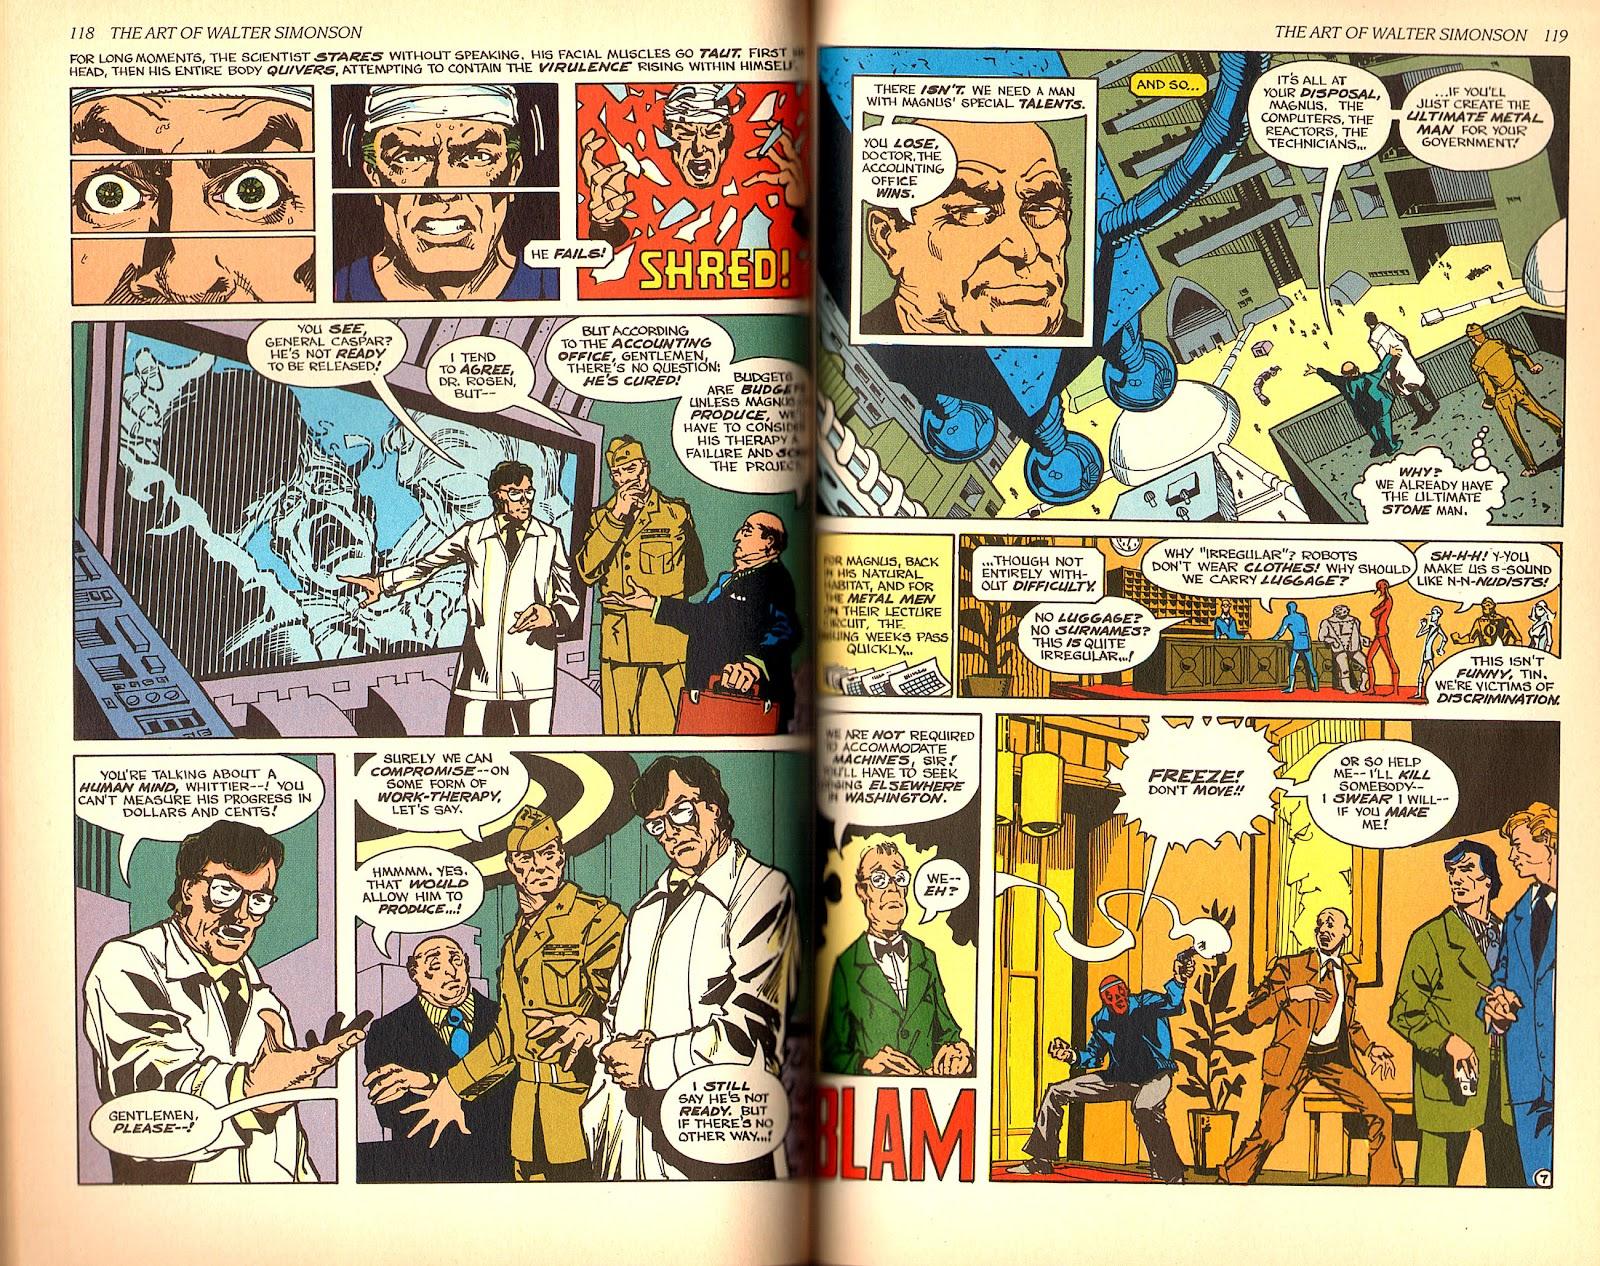 Read online The Art of Walter Simonson comic -  Issue # TPB - 61